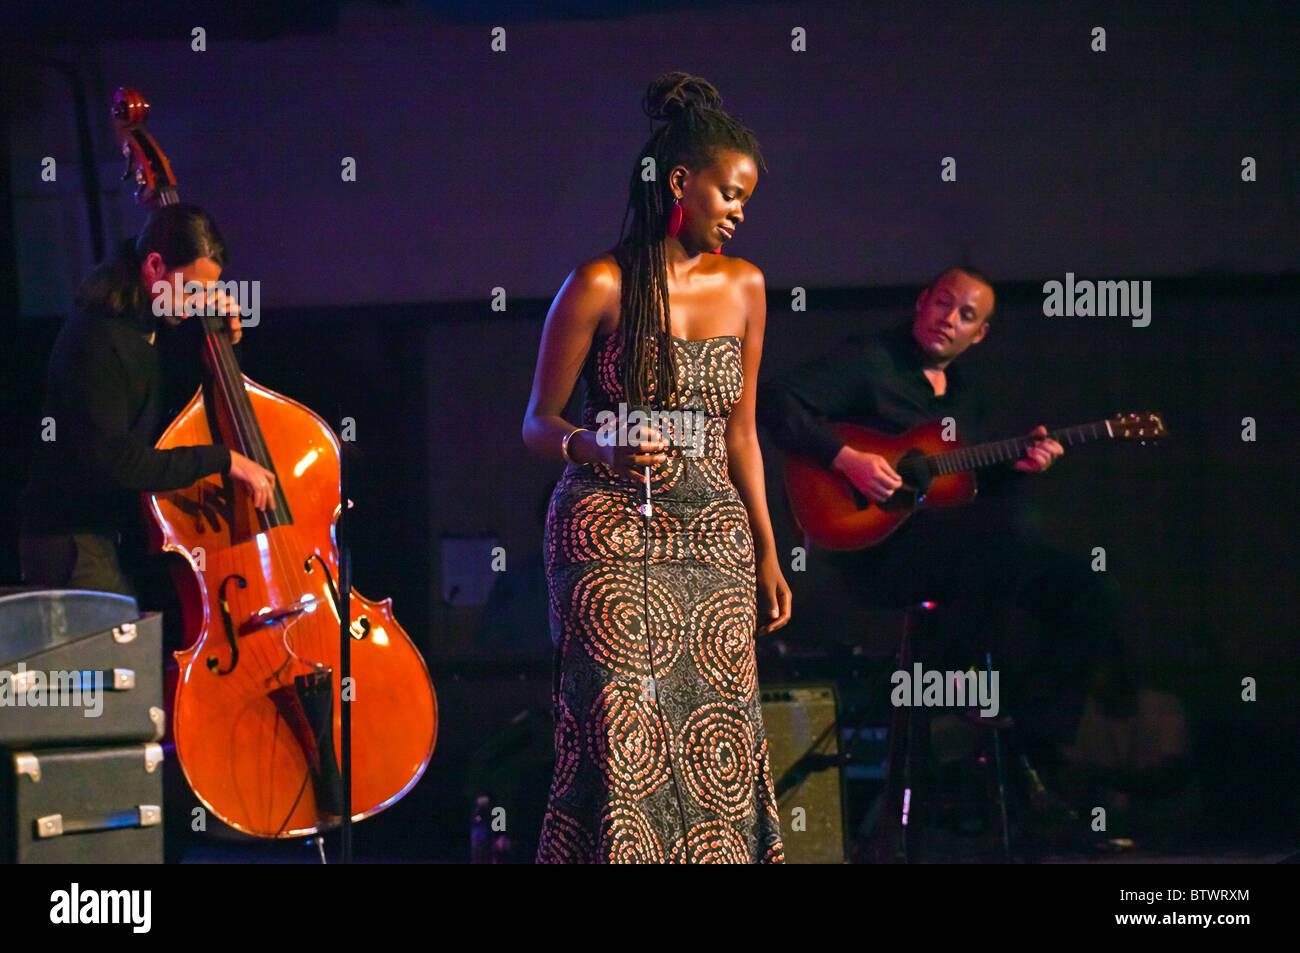 SOMI sings for an entranced crowd in Dizzys Den - 2010 MONTEREY JAZZ FESTIVAL, CALIFORNIA - Stock Image